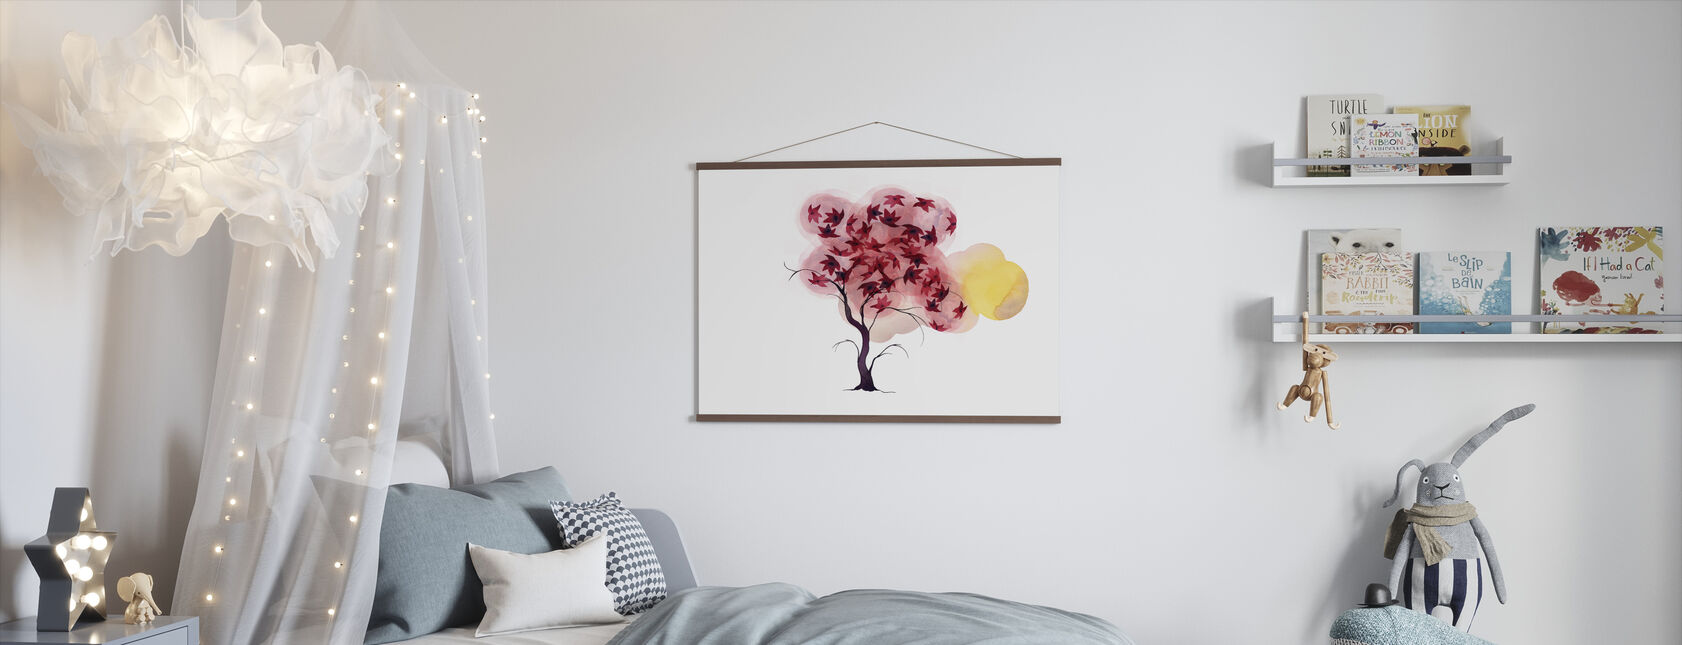 Water Color Trees II - Poster - Kids Room